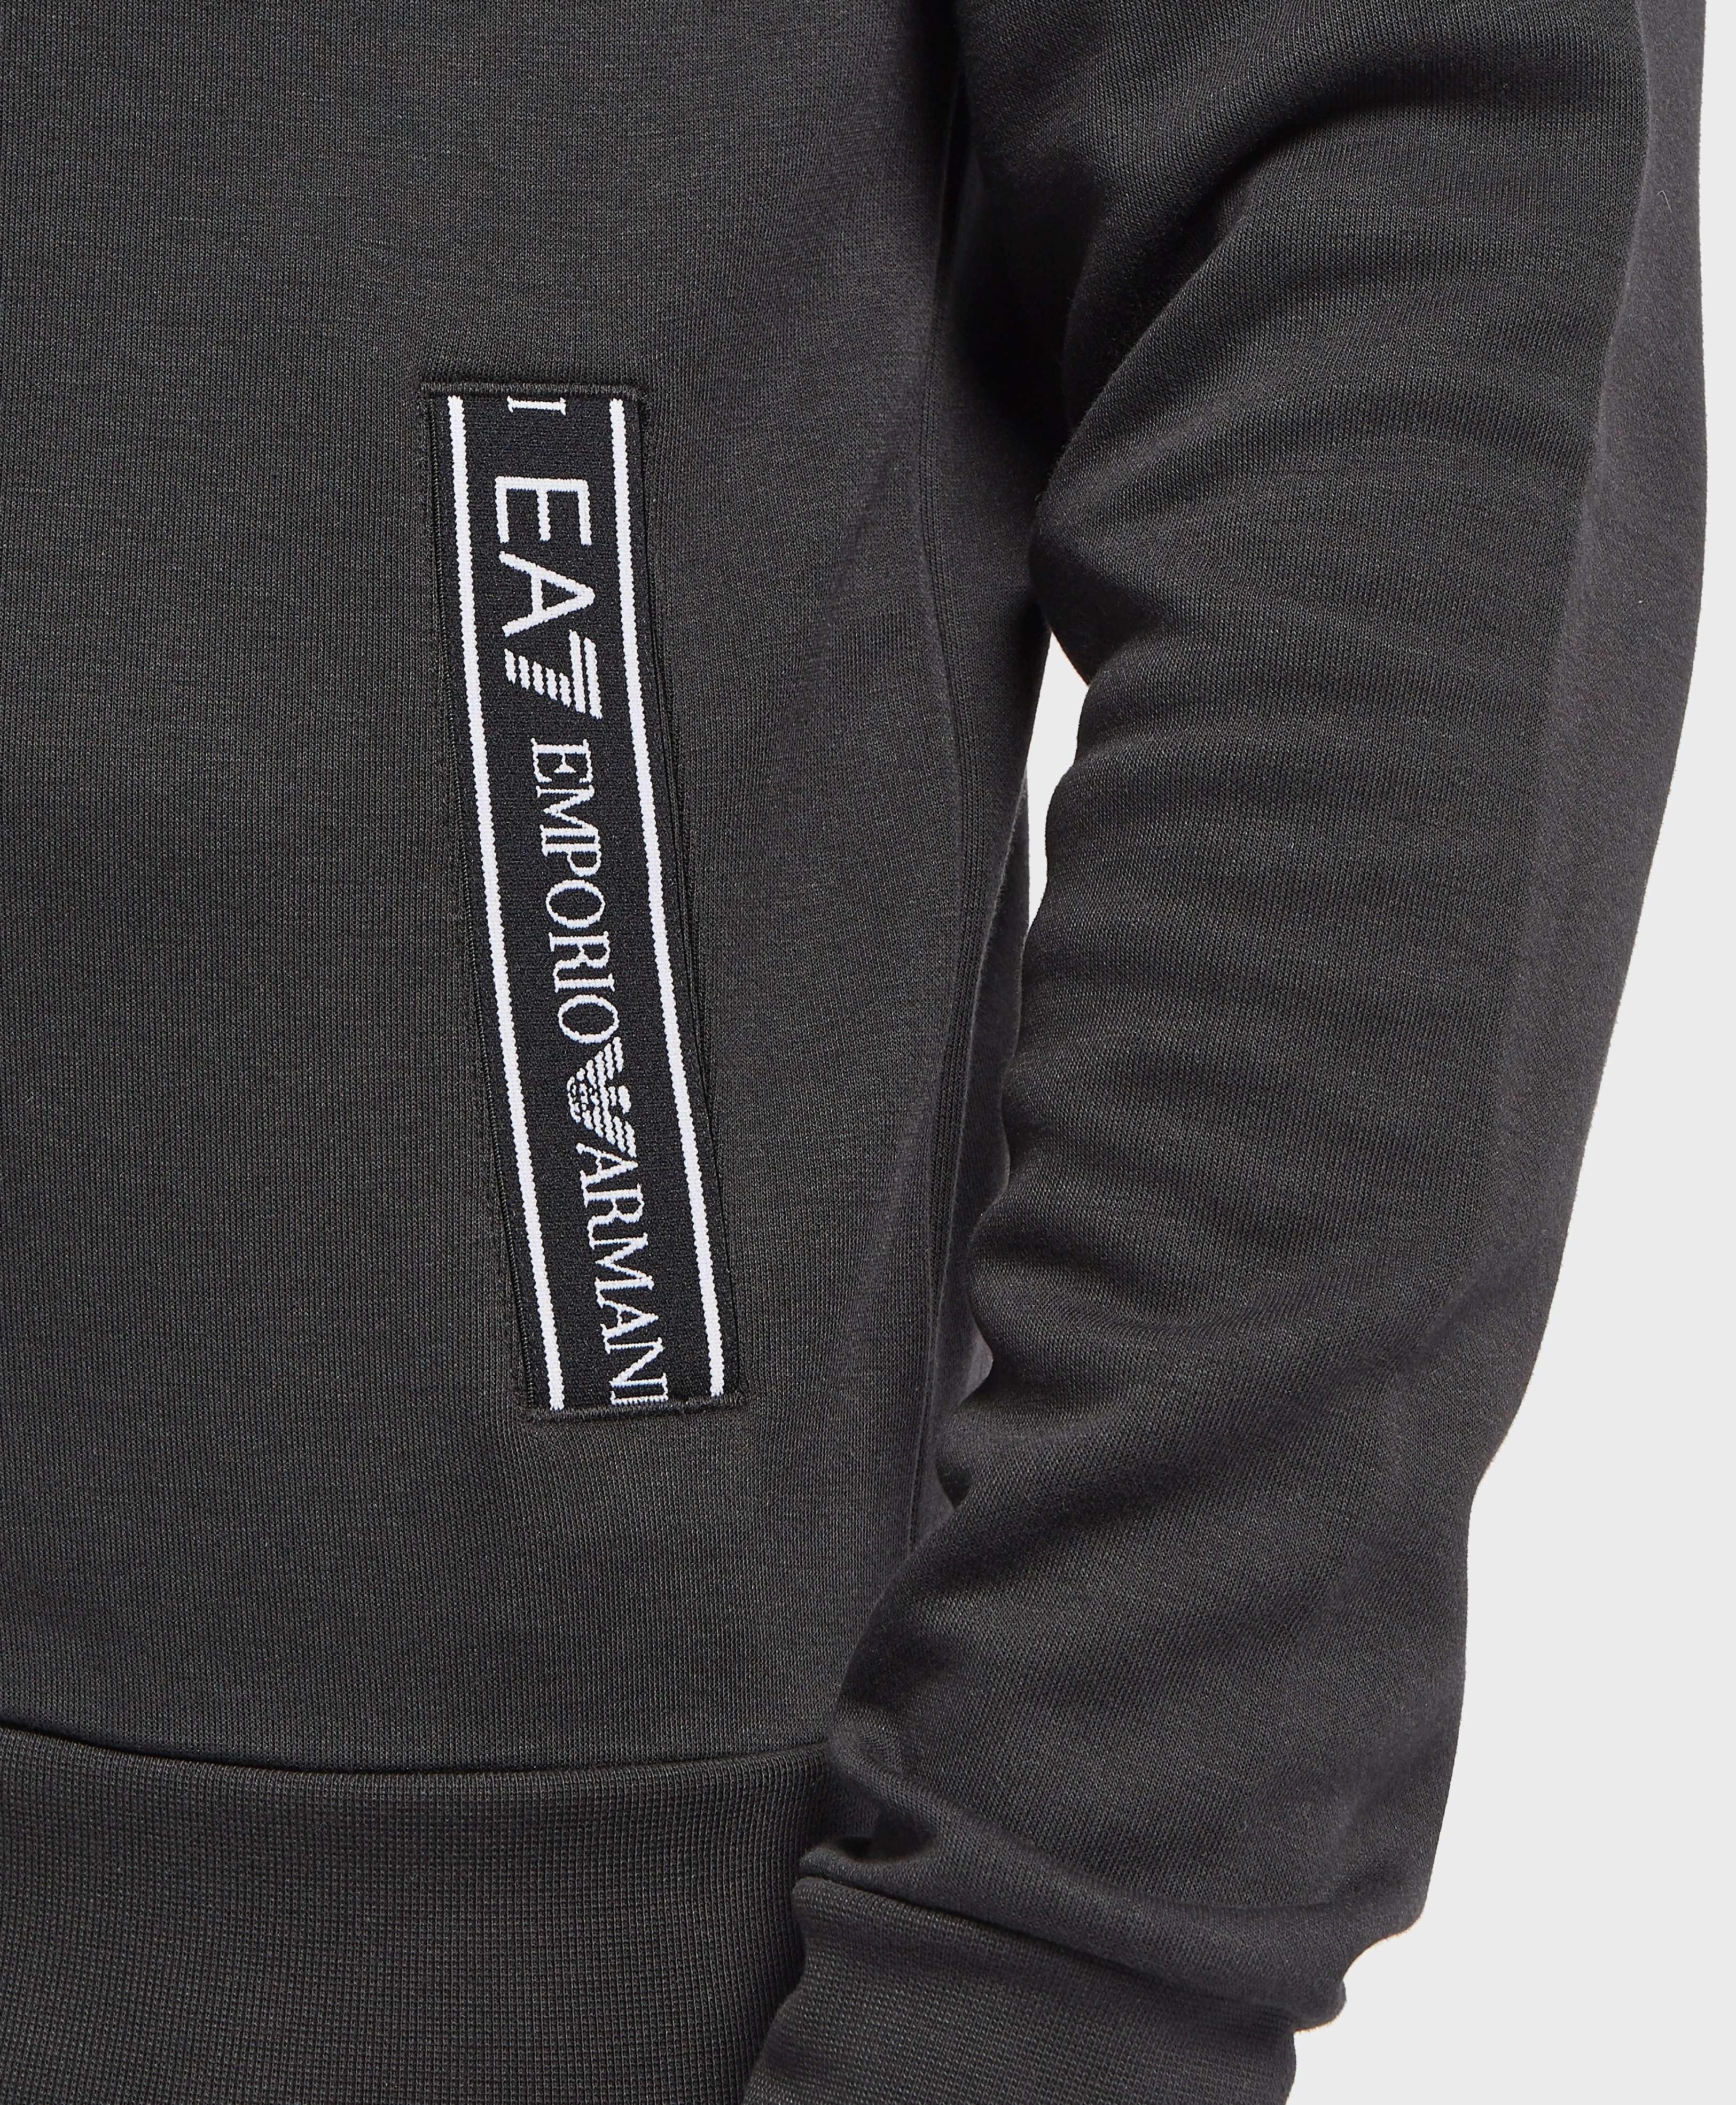 Emporio Armani EA7 Tape Full Zip Hoodie - Exclusive